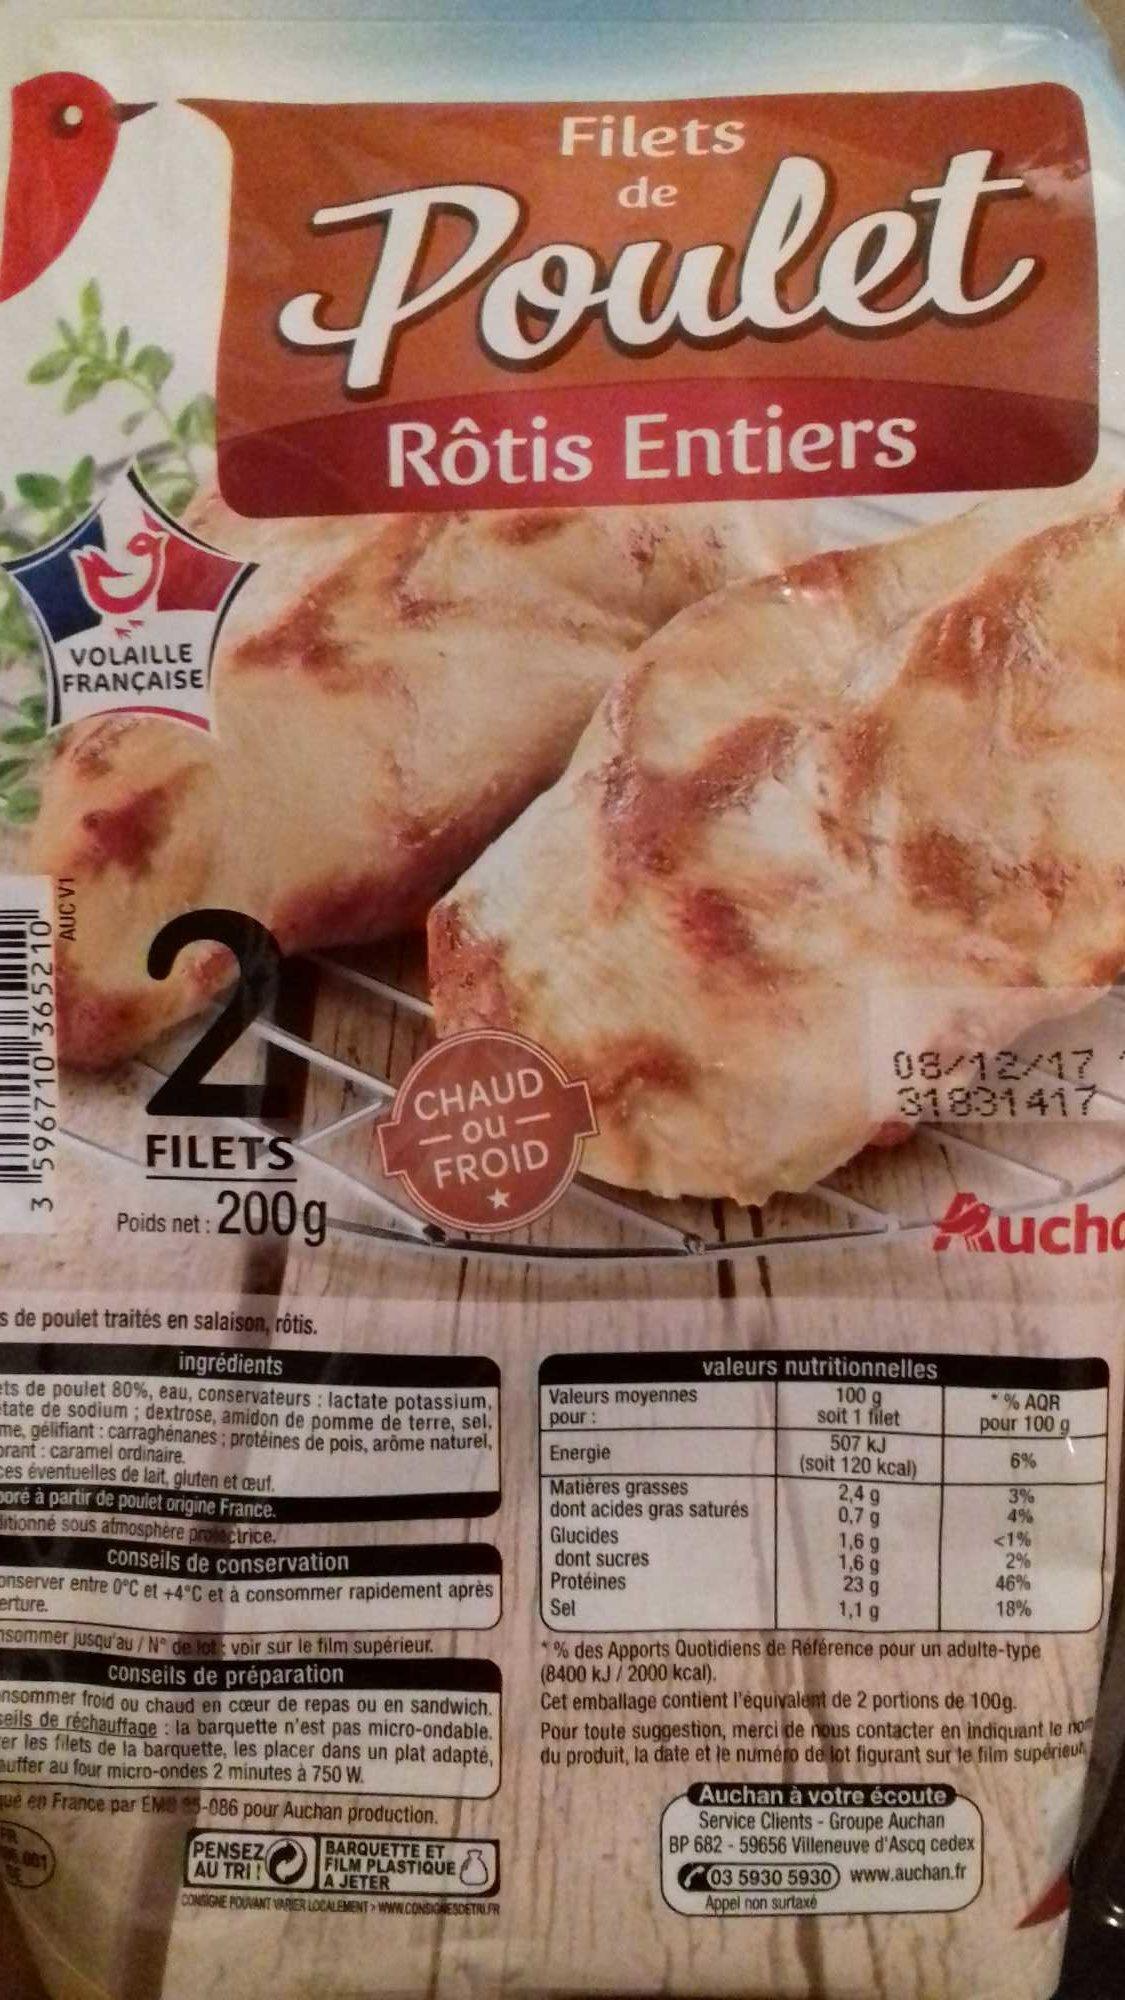 Poulet rôti filets *2 - Produit